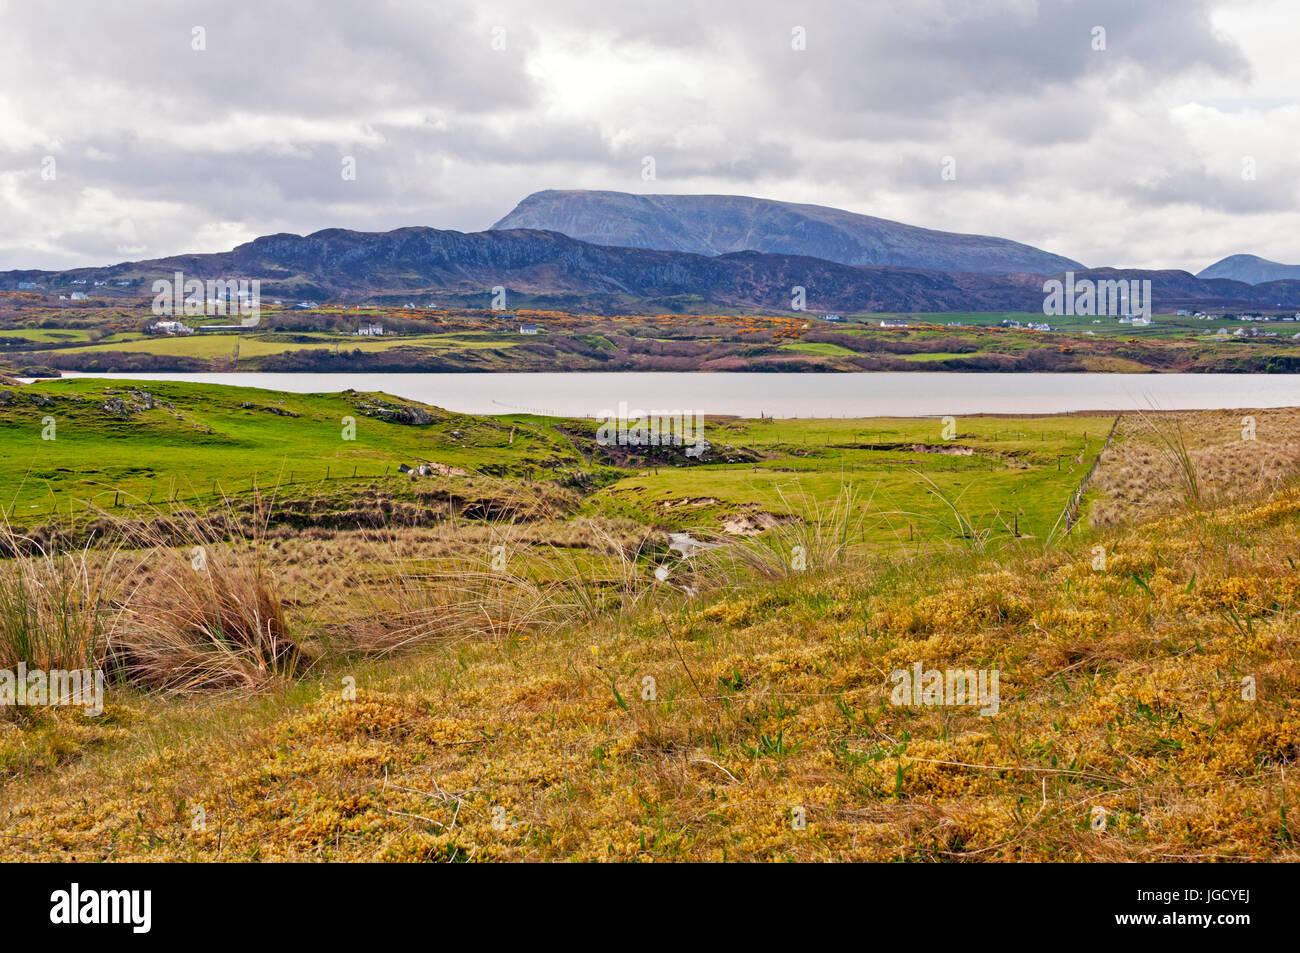 Looking toward Muckish Mountain, County Donegal, Ireland - Stock Image